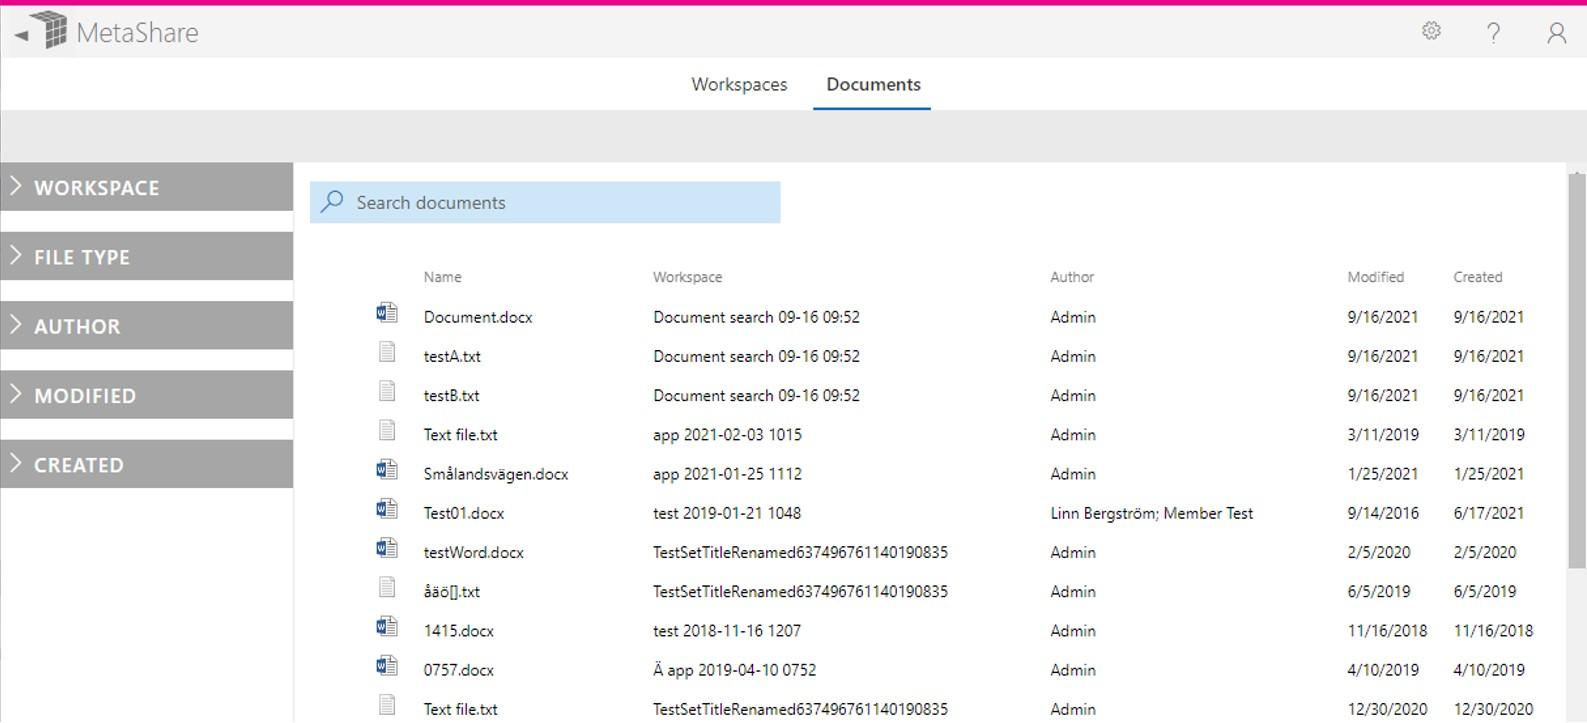 MetaShare's new document tab